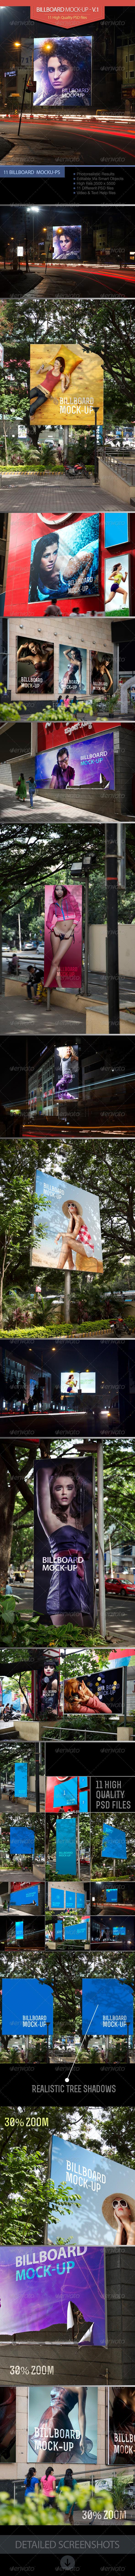 Billboard Mock-Up - Posters Print